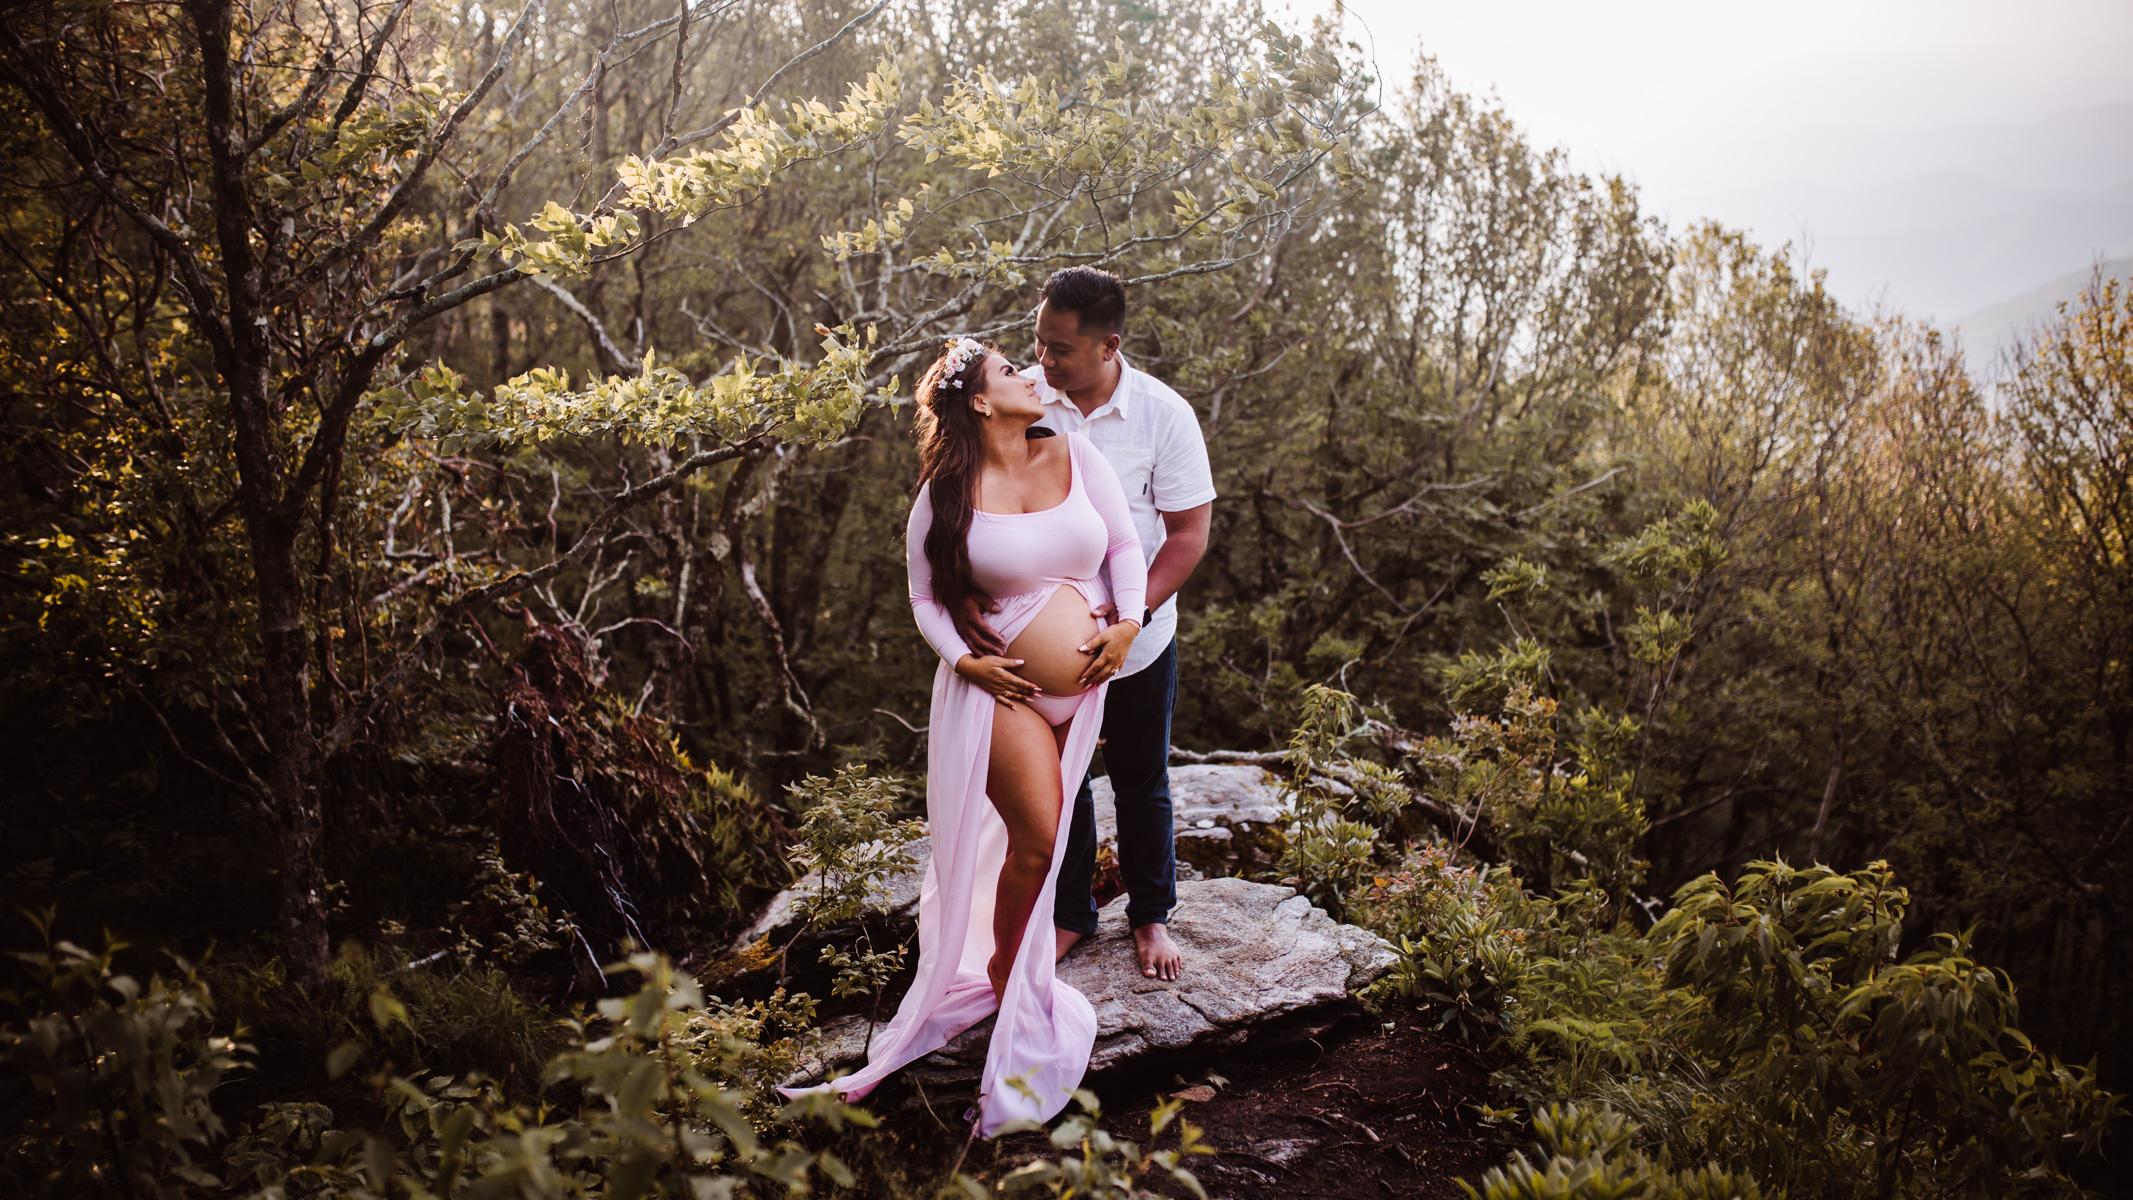 Craggy Gardens, Asheville North Carolina | Maternity Session on the Blue Ridge Parkway by Greensboro Winston-Salem Photographer | Kayli LaFon Photography